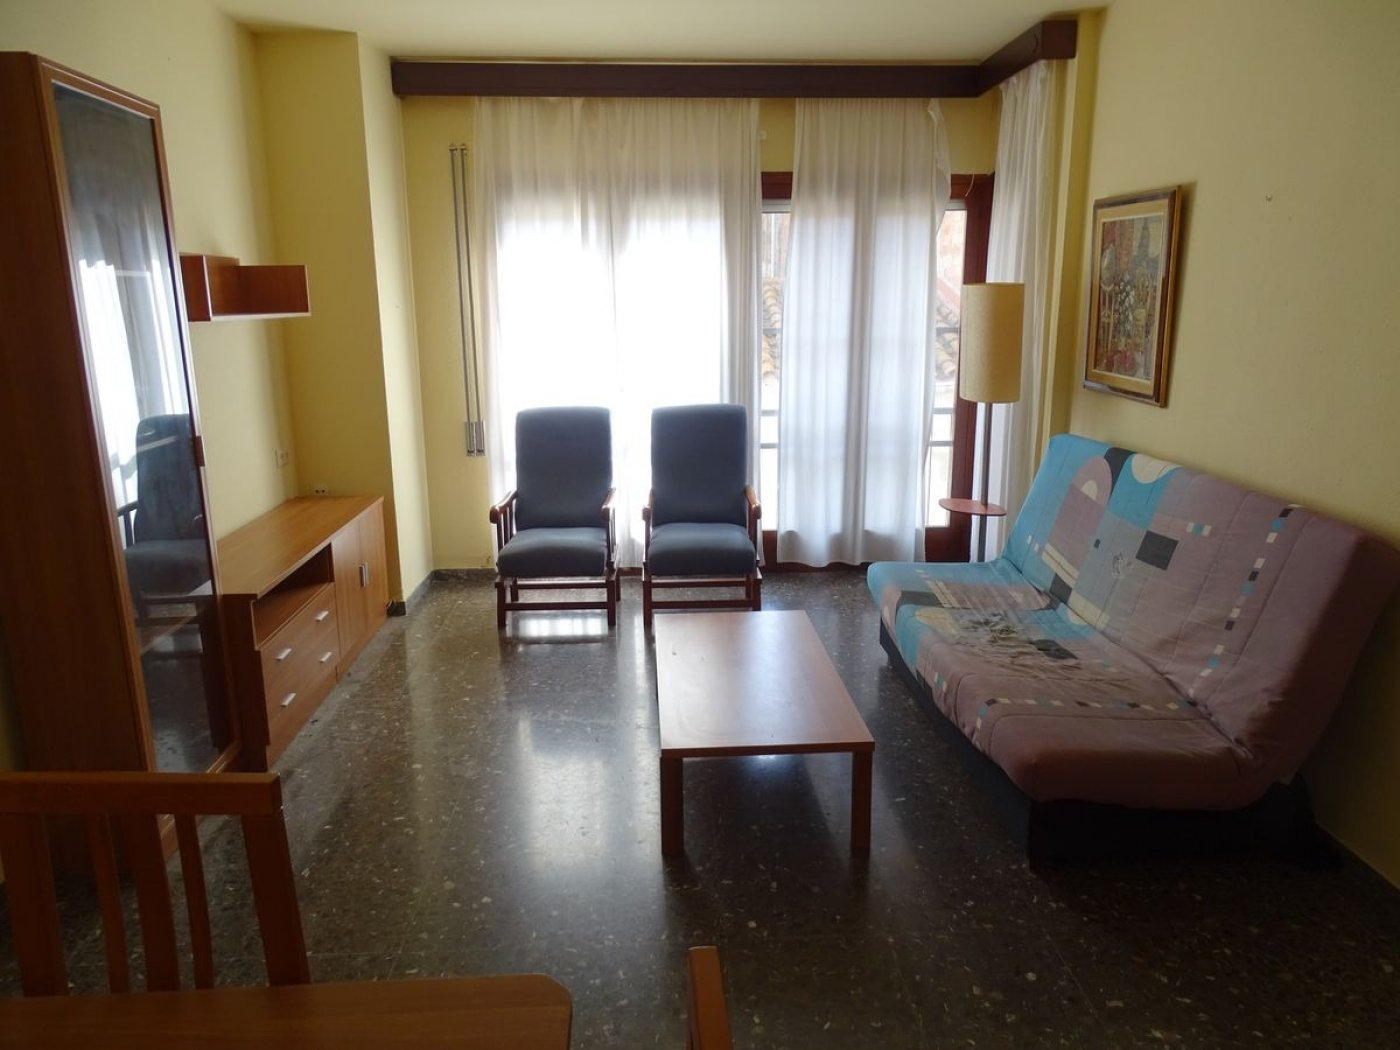 Flat for sale in CENTRE, Sant Carles de la Rapita